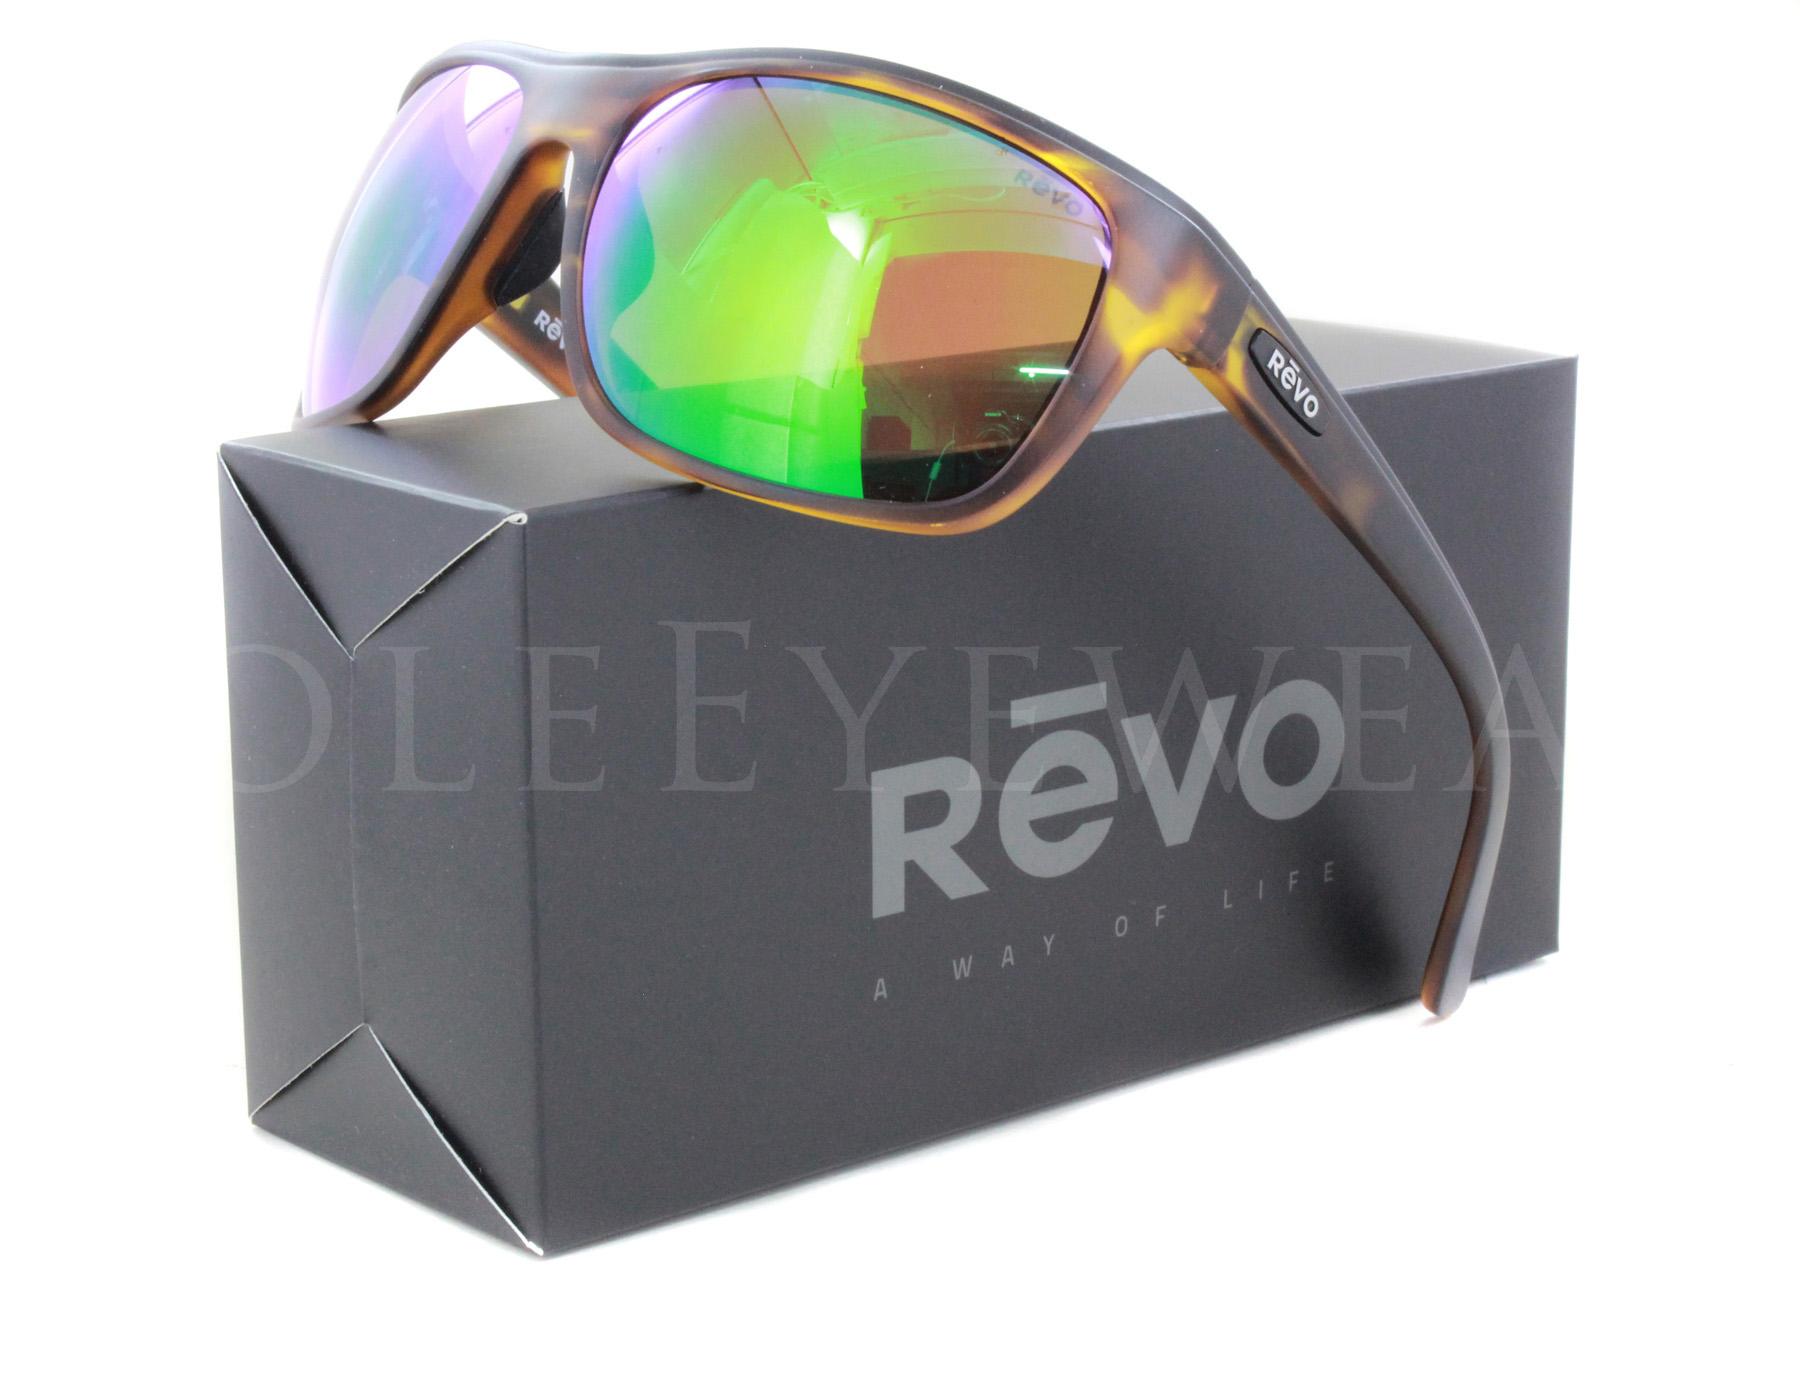 66e0fdf292 Details about NEW Revo 1023 02 GN Remus Matte Tortoise   Green Water  Sunglasses